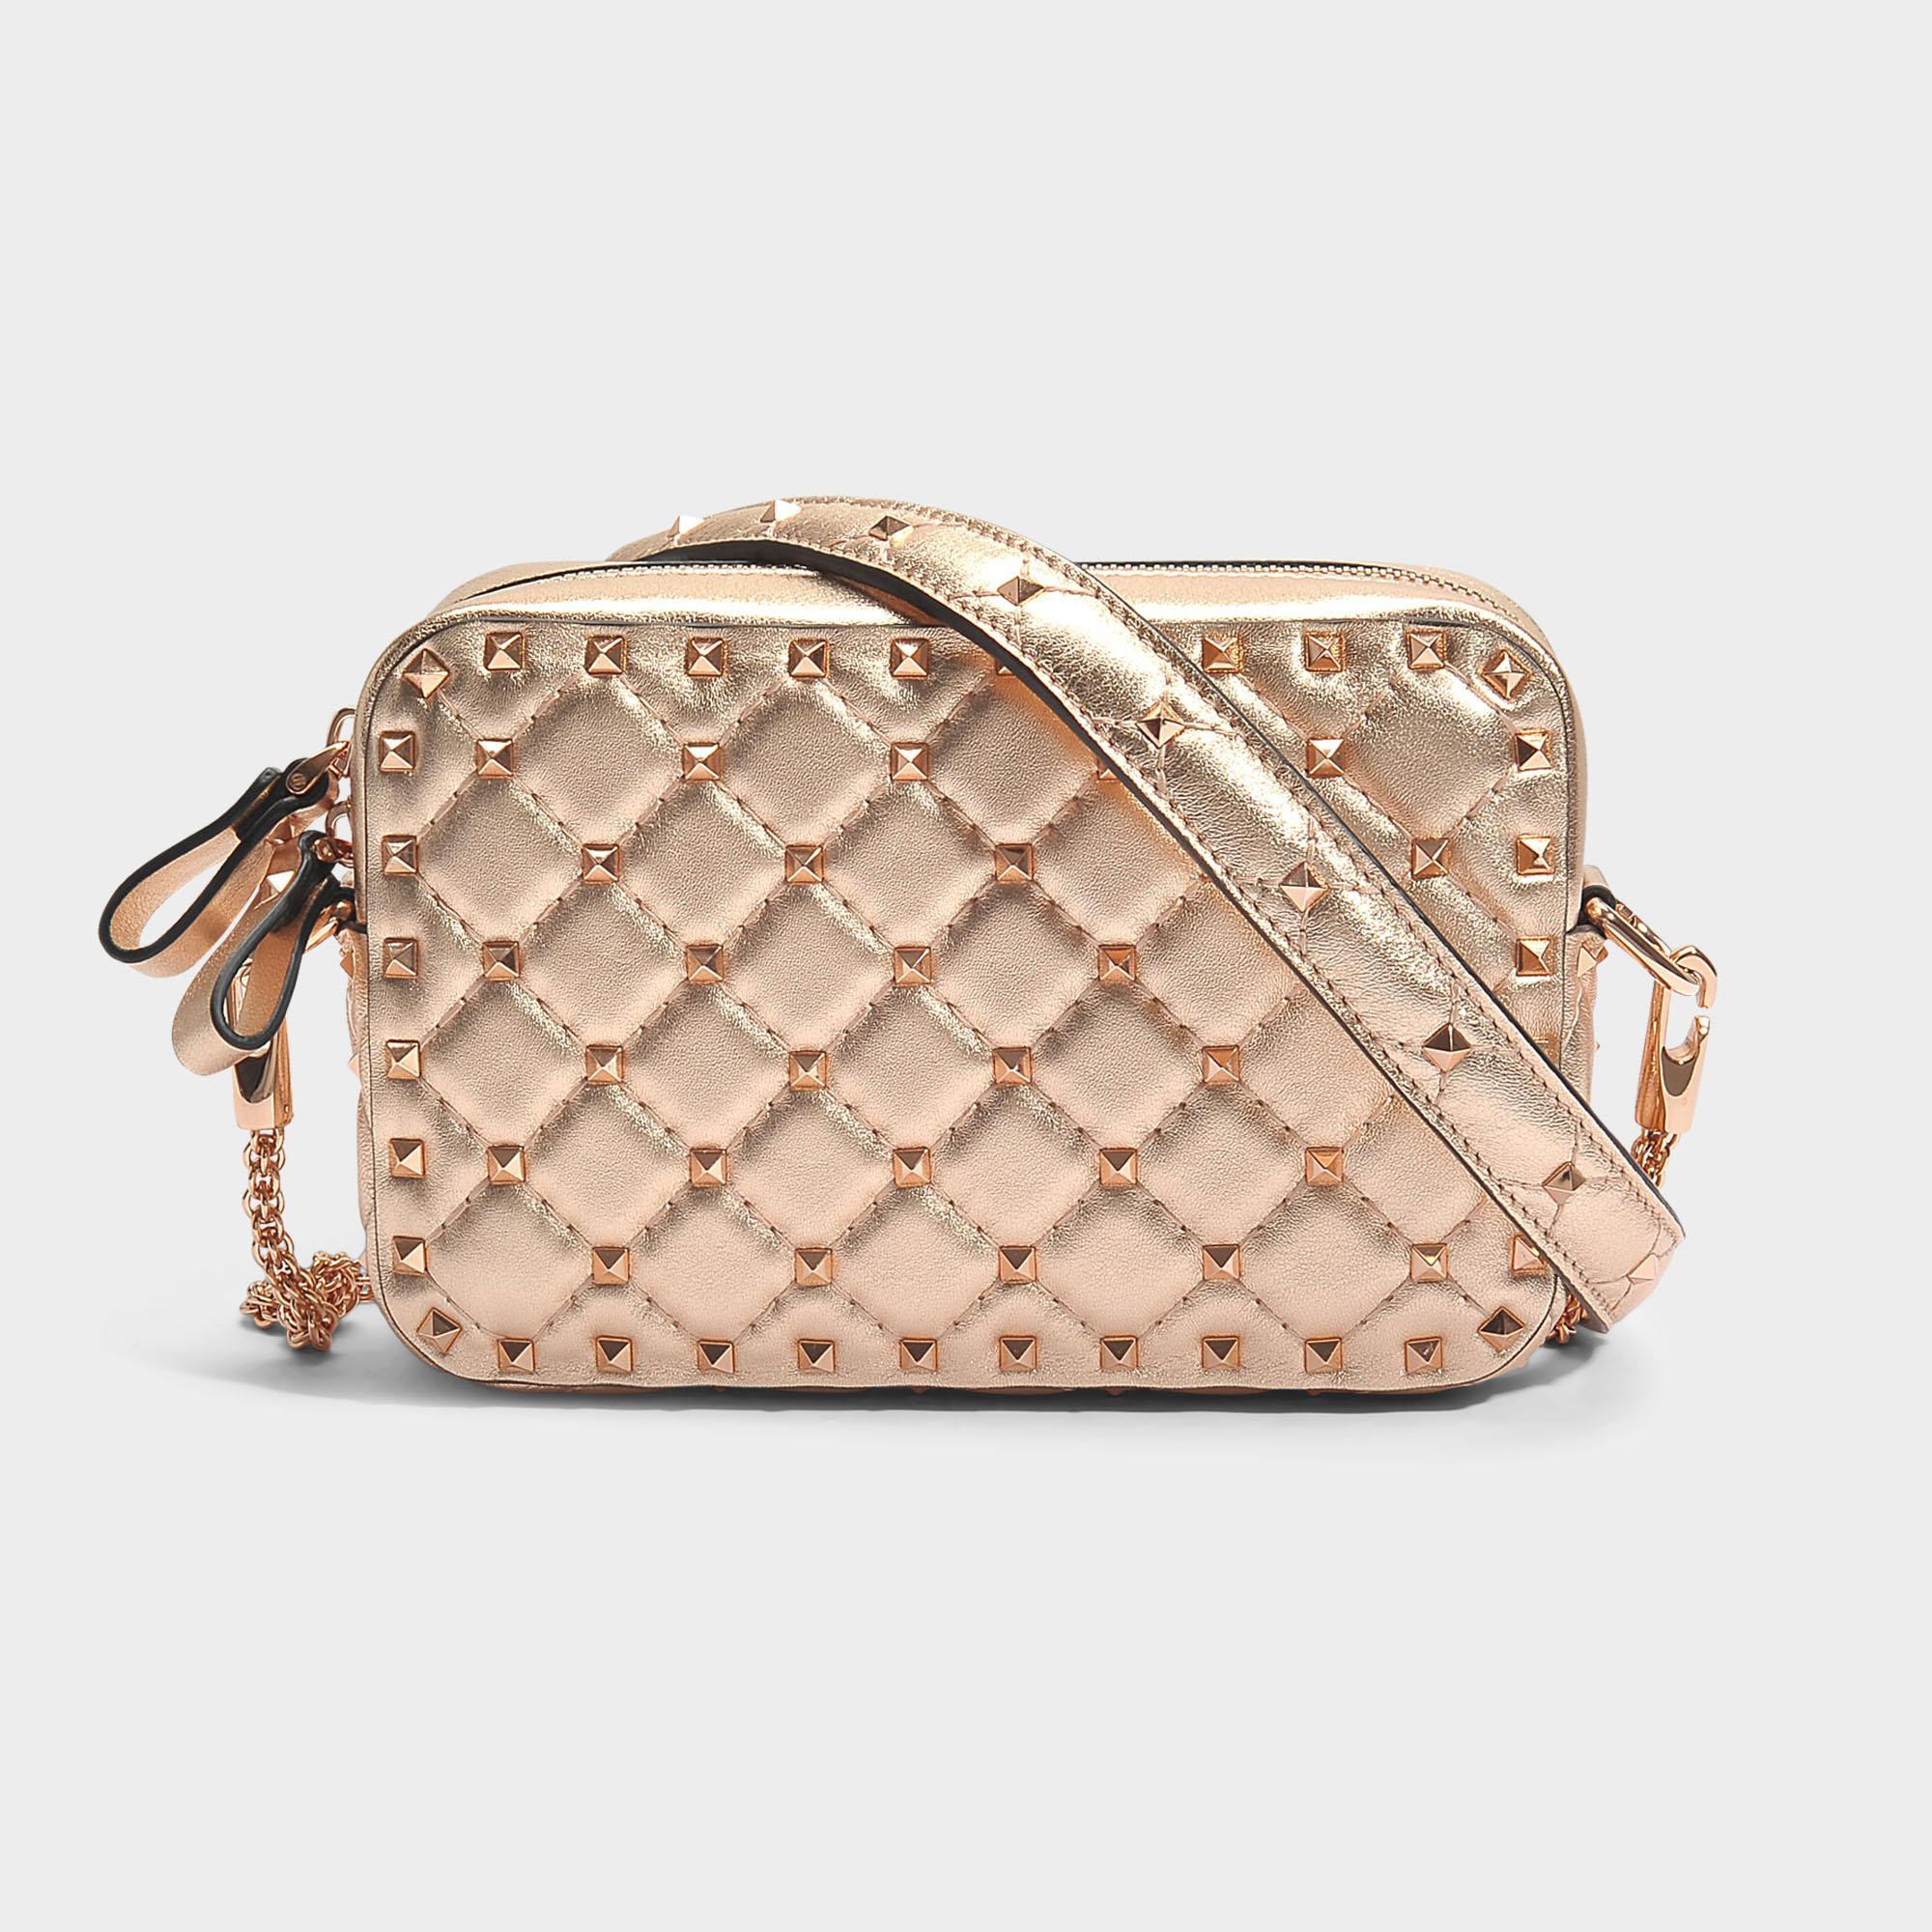 Metallic Rockstud Spike Crossbody Bag in Gold Metallic Calf Valentino BGa5w